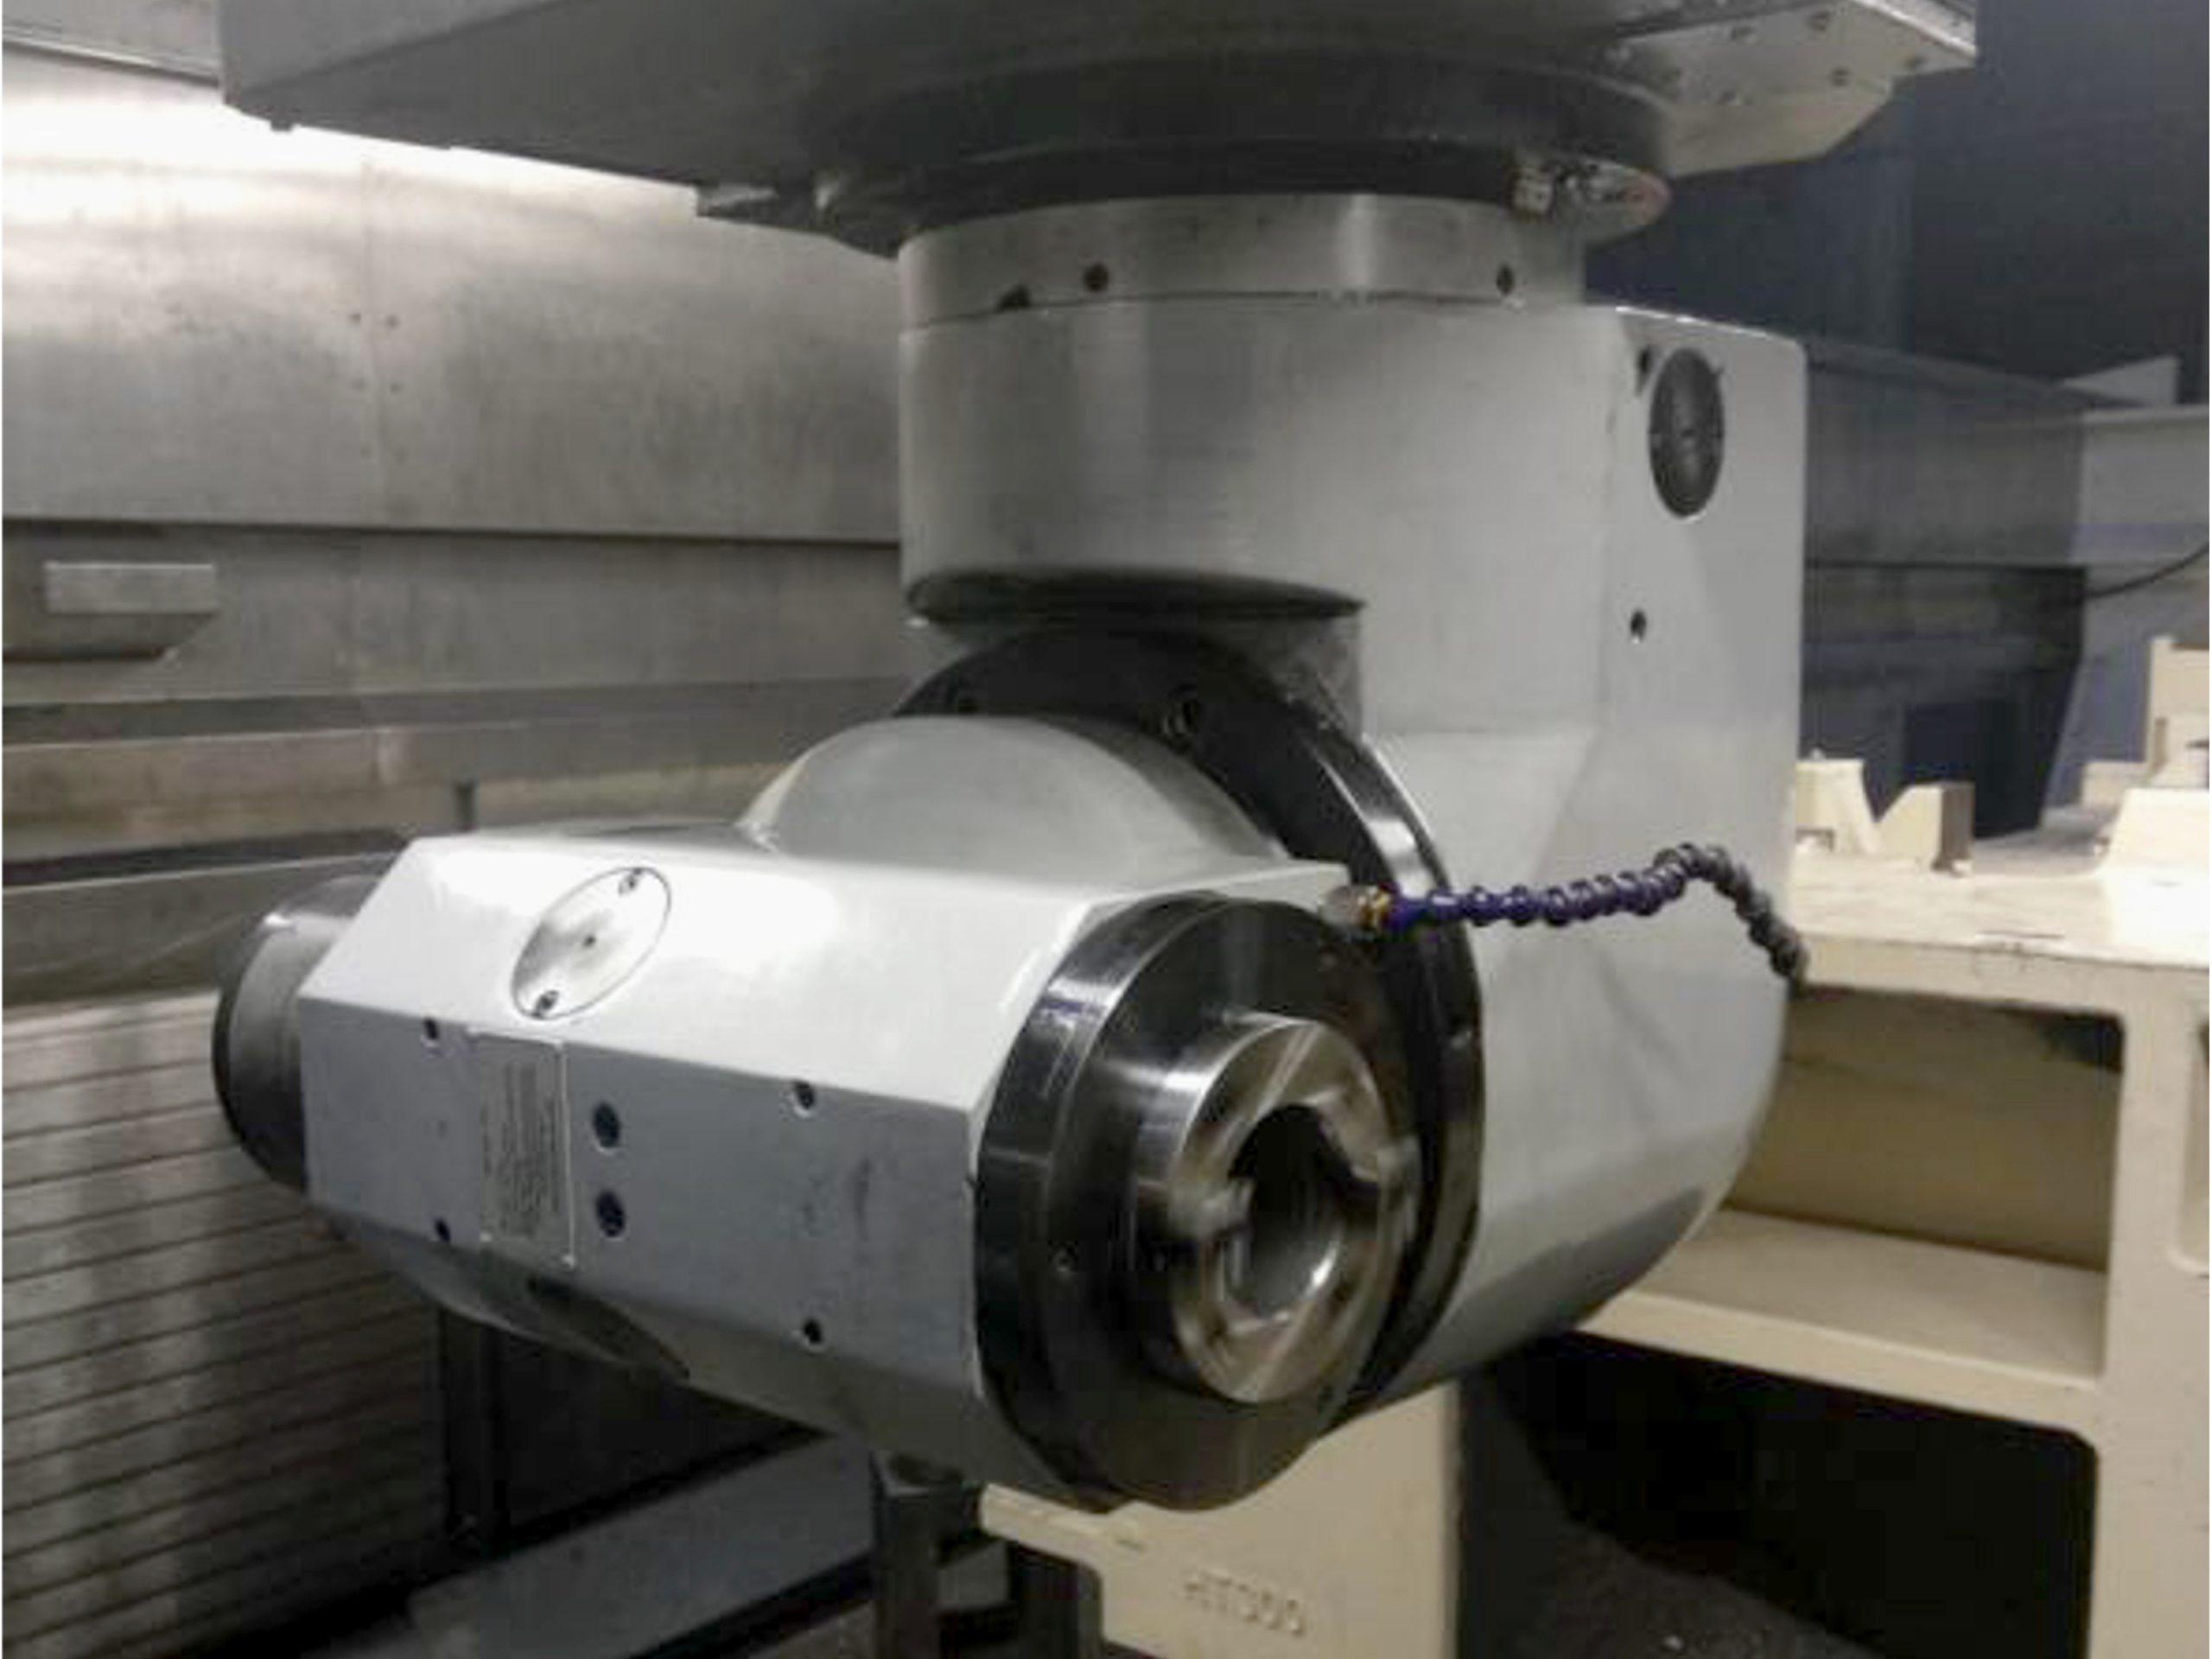 EMENA cabezal de fresado milling head CVOI en maquina 2